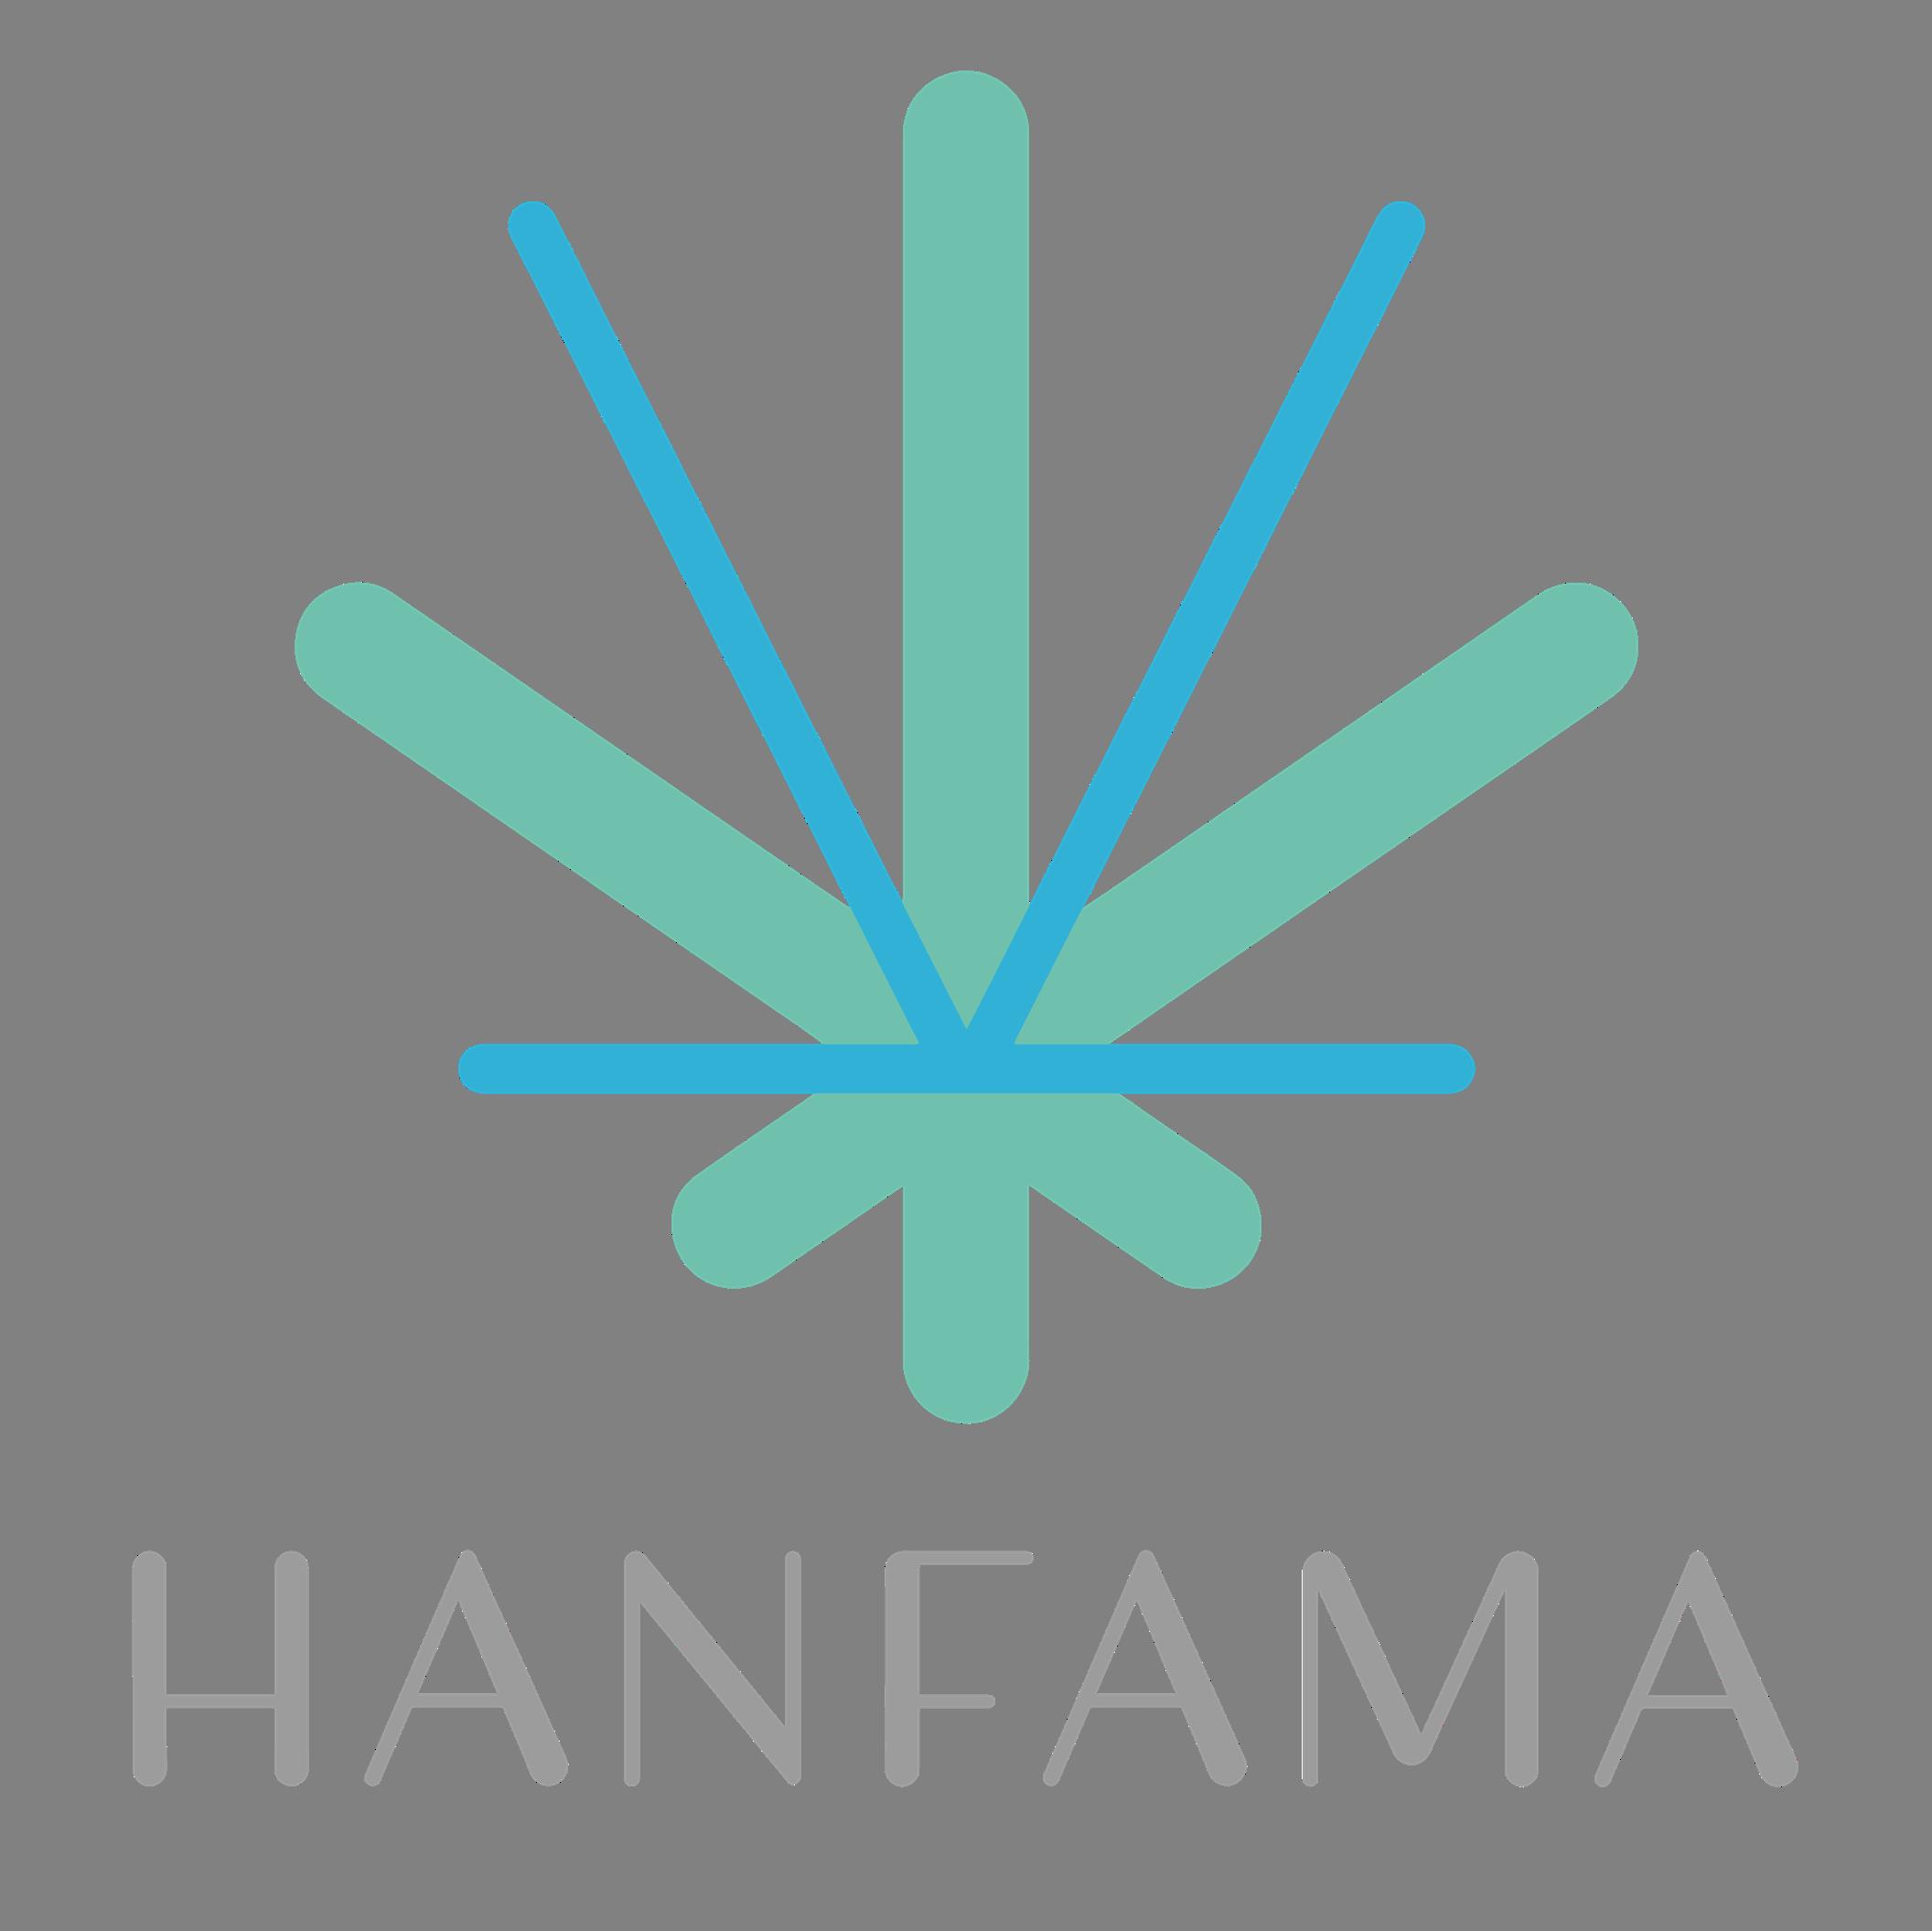 HANFAMA